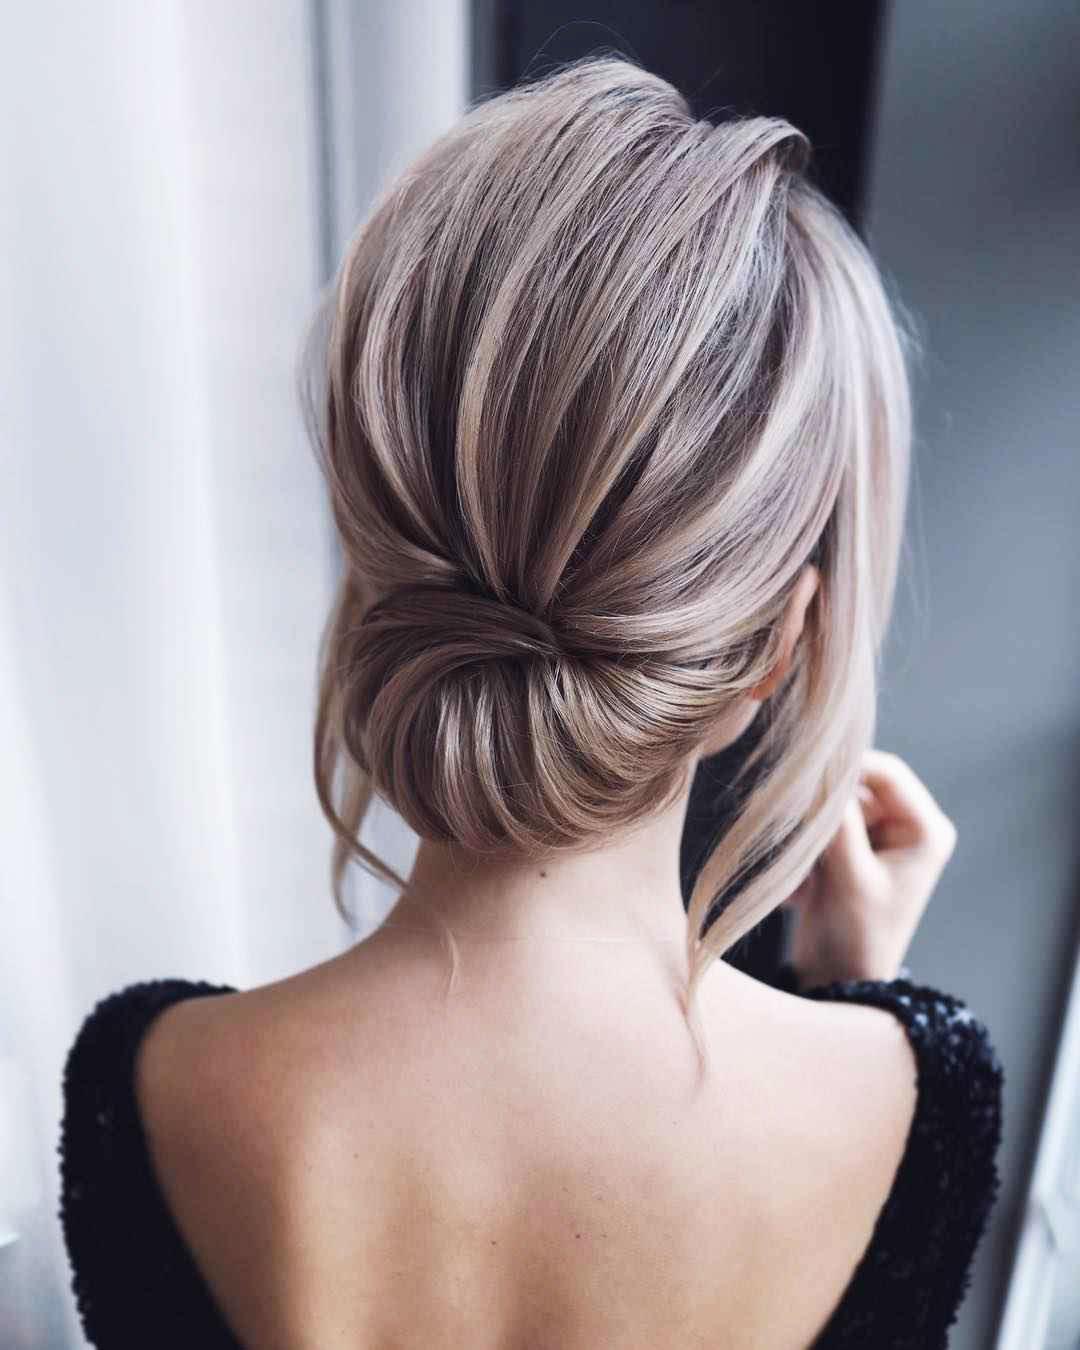 Hairstyles white round braid